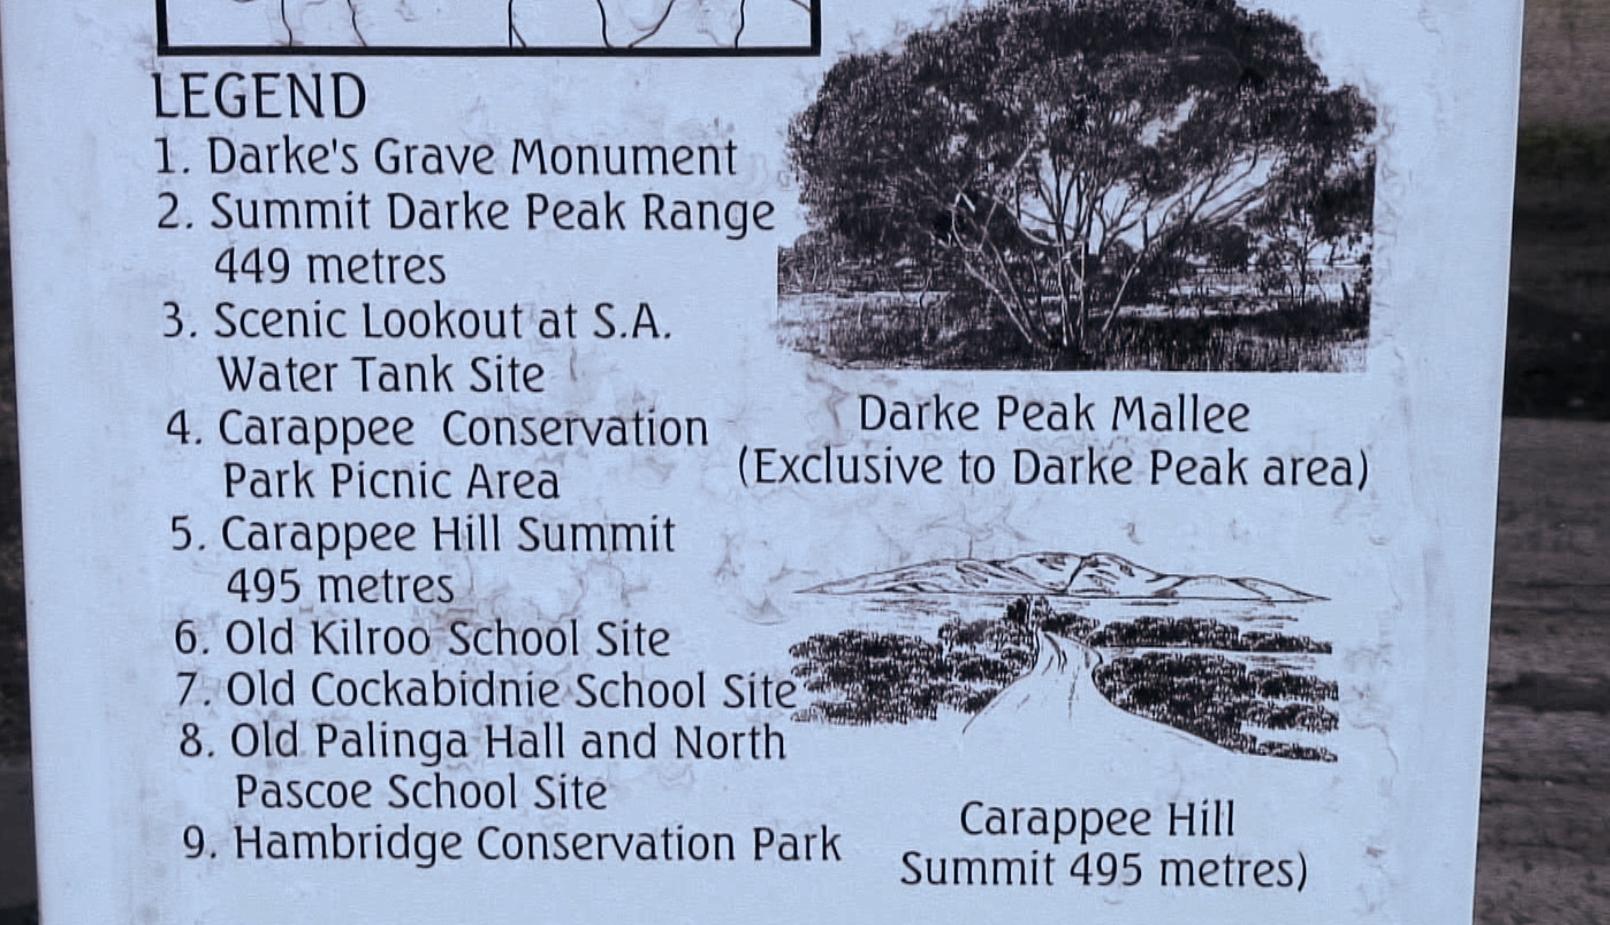 history of Darke Peak